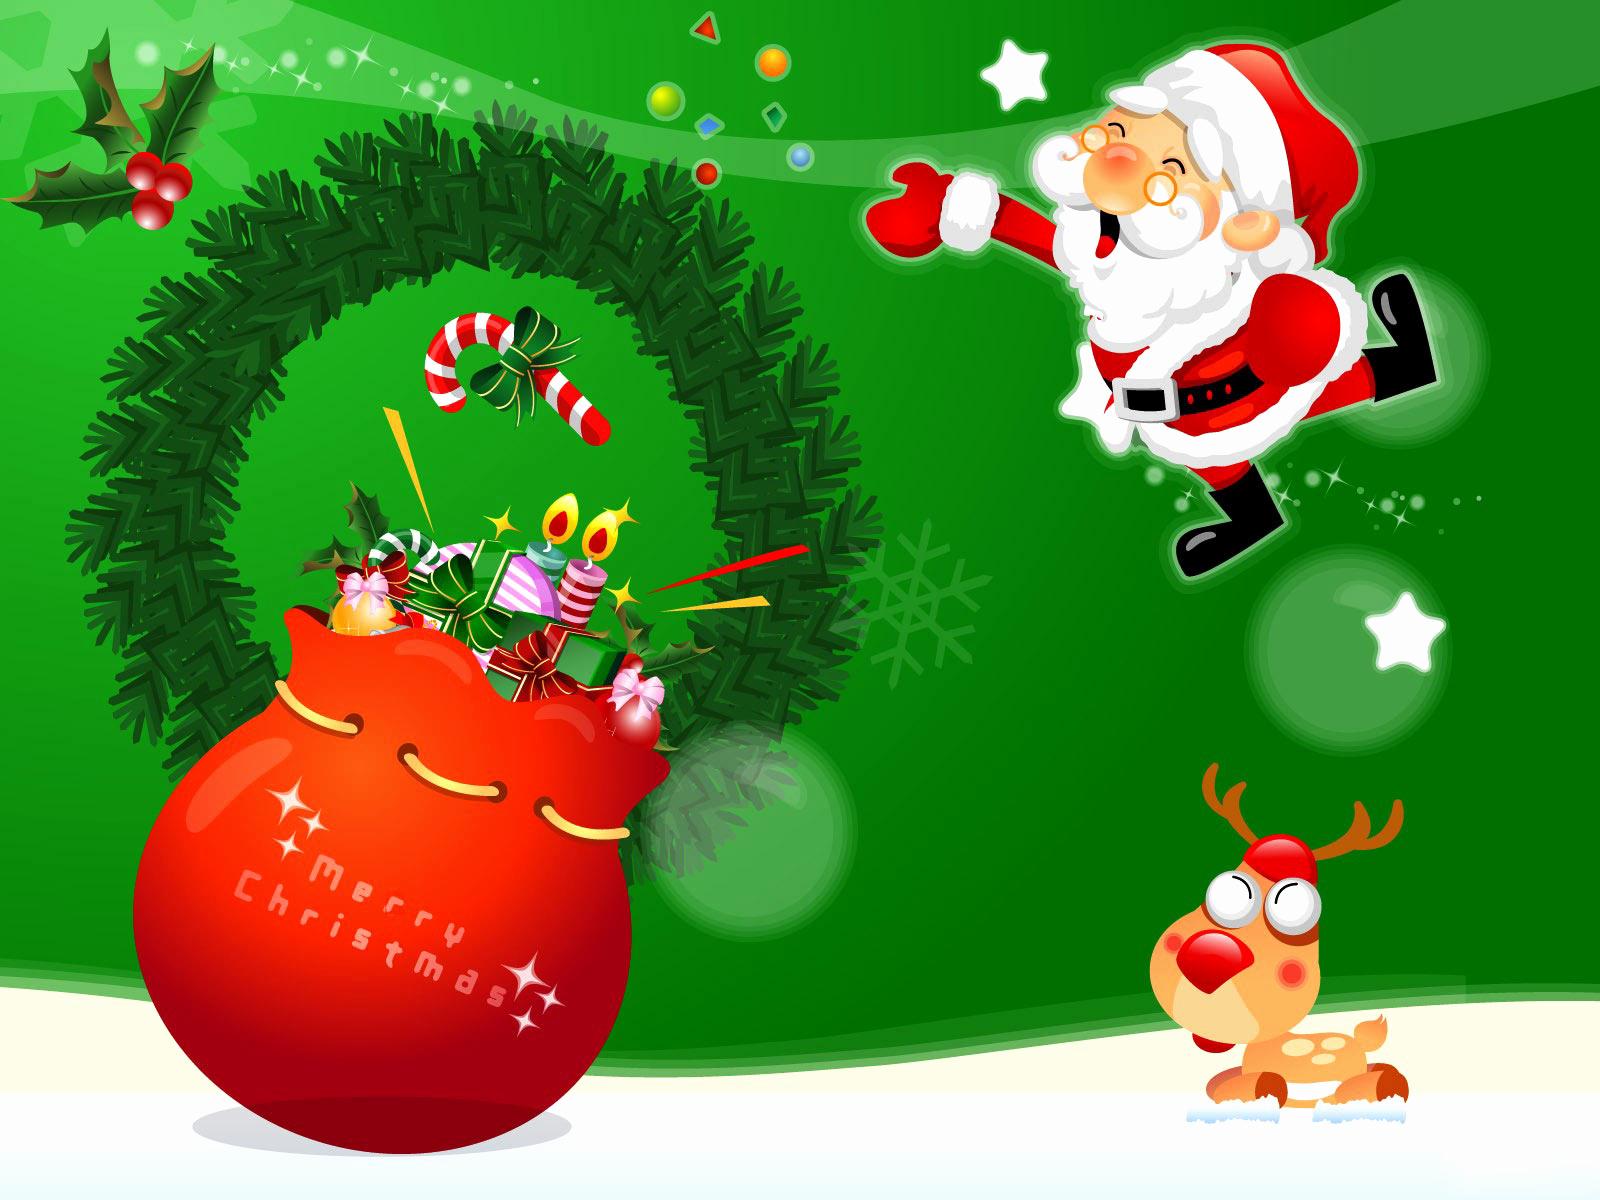 Free Christmas Desktop Wallpaper Beautiful Hot Wallpapers Blog S 2011 Christmas Wallpapers Free for